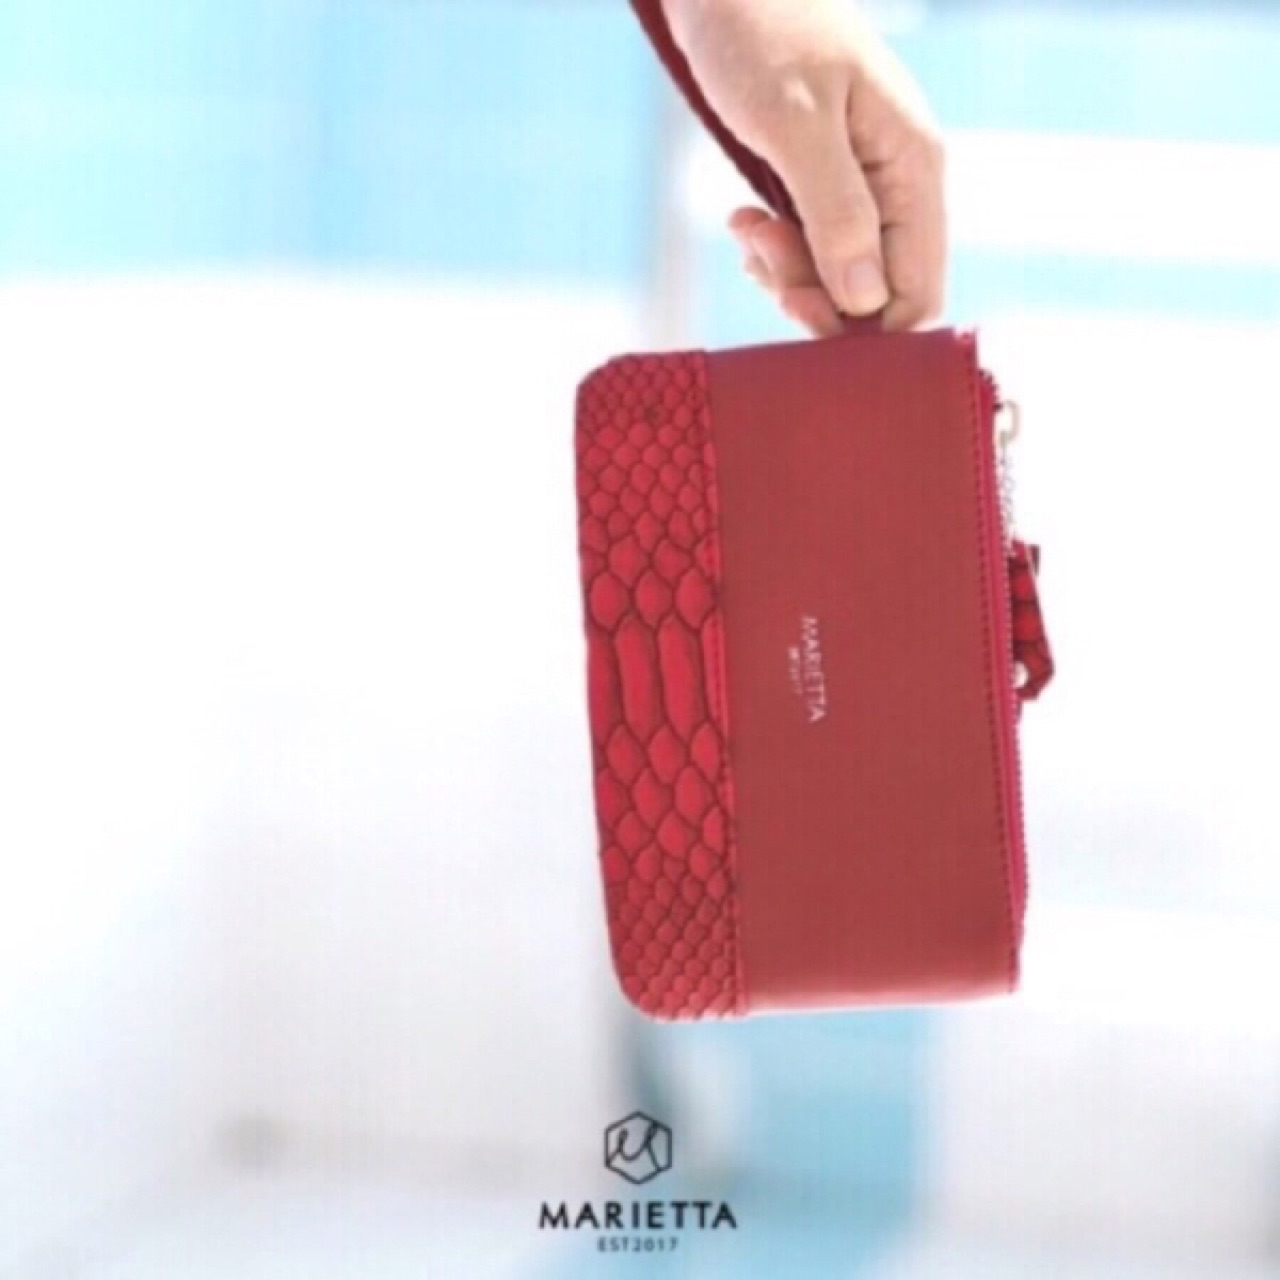 TinnyLINDA,กระเป๋า,กระเป๋าสตางค์,กระเป๋าถือ,กระเป๋าใบเล็ก